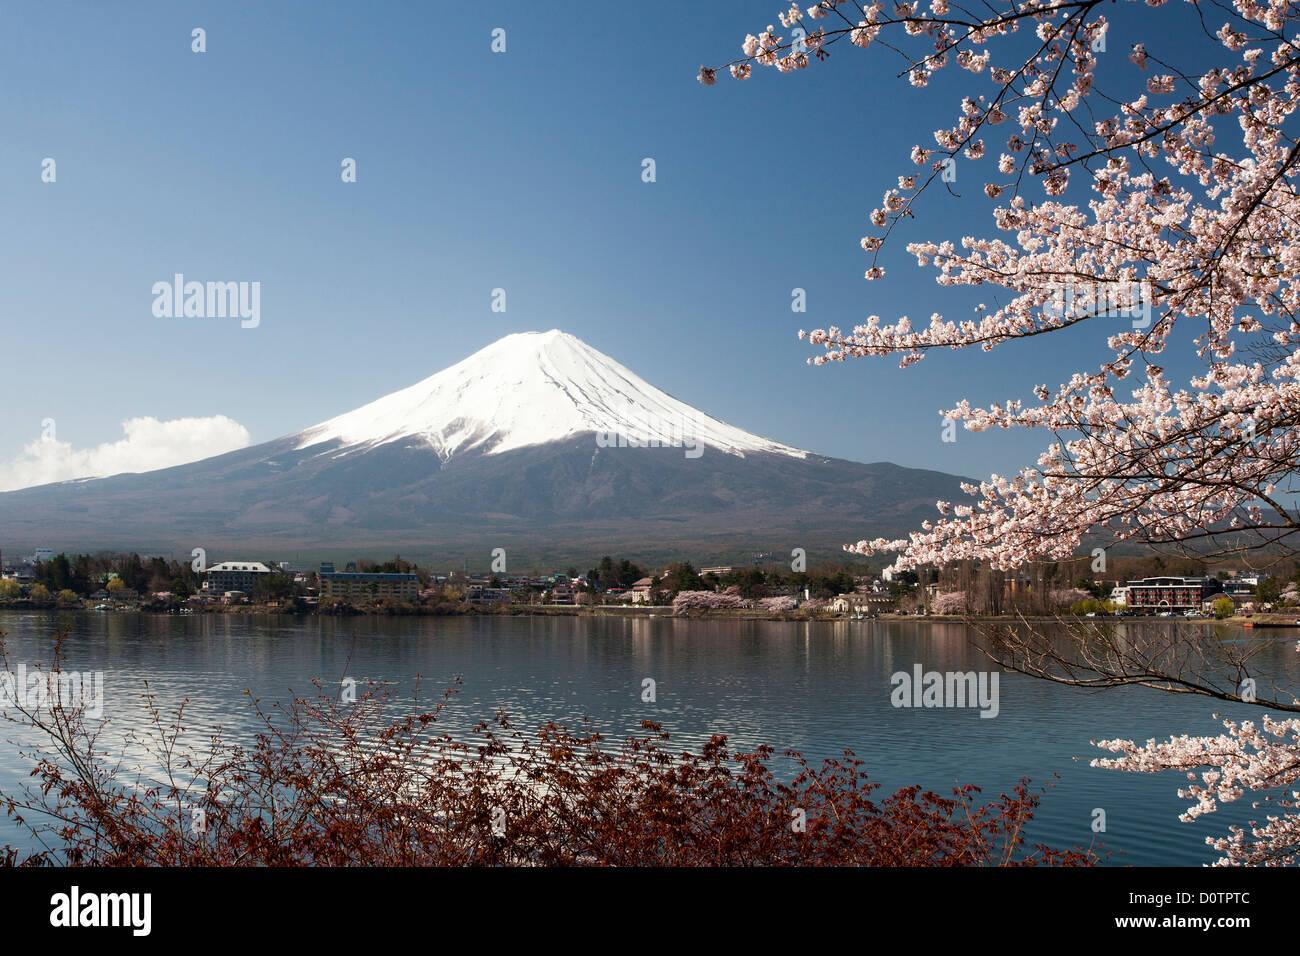 Japan, Asien, Urlaub, Reisen, Kirschblüten, Yamaguchi, See, Fuji, Mount Fuji, Fujiyama, Landschaft, Berg, Schnee, Stockbild